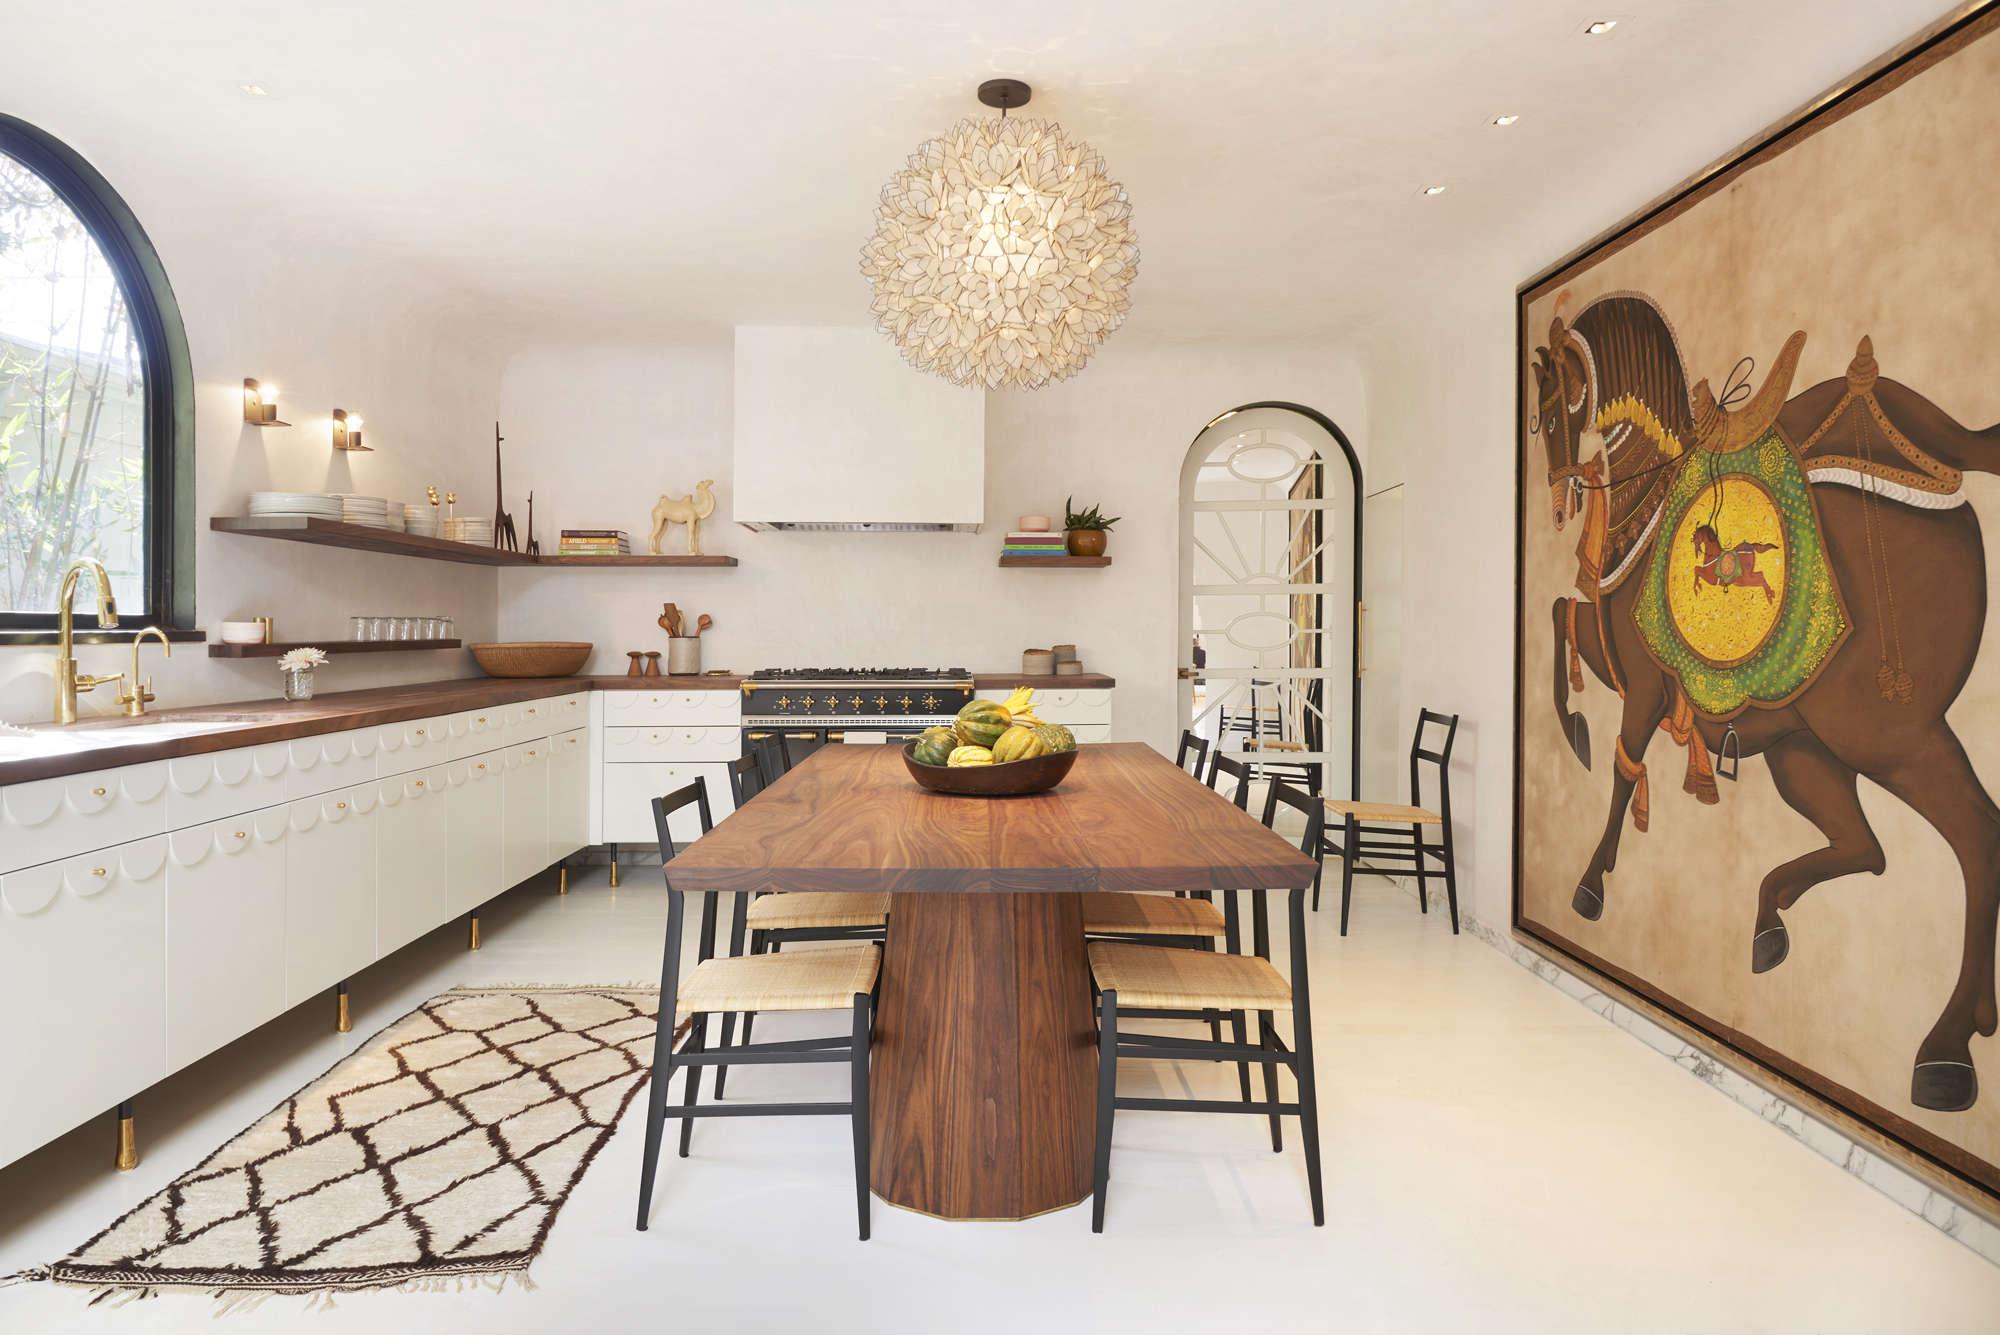 Kitchen of the Week: Irene Neuwirth's Glamorous LA Kitchen by ...